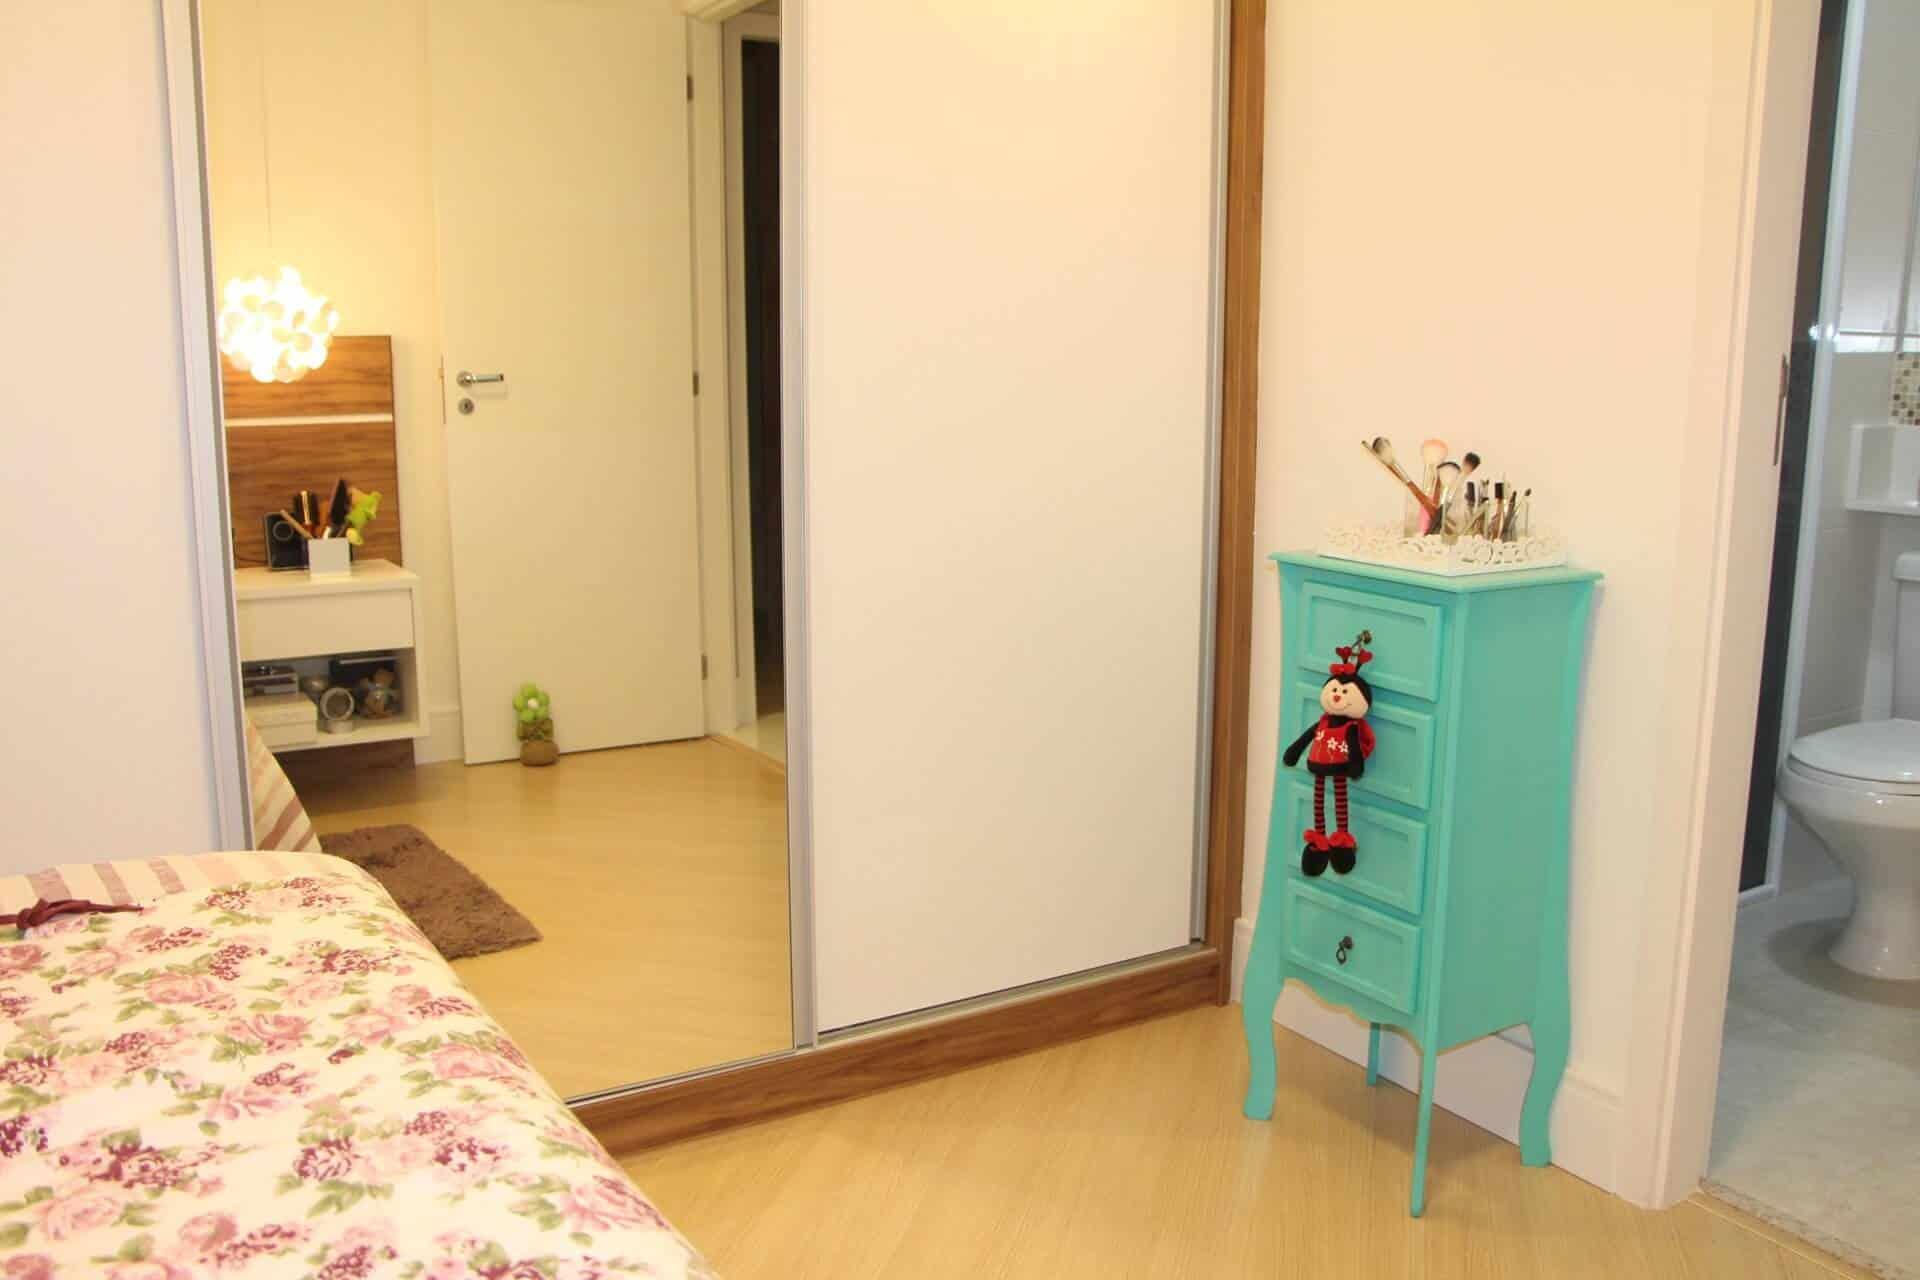 dormitorio-planejado_moveis-sob-medida-galeria-119